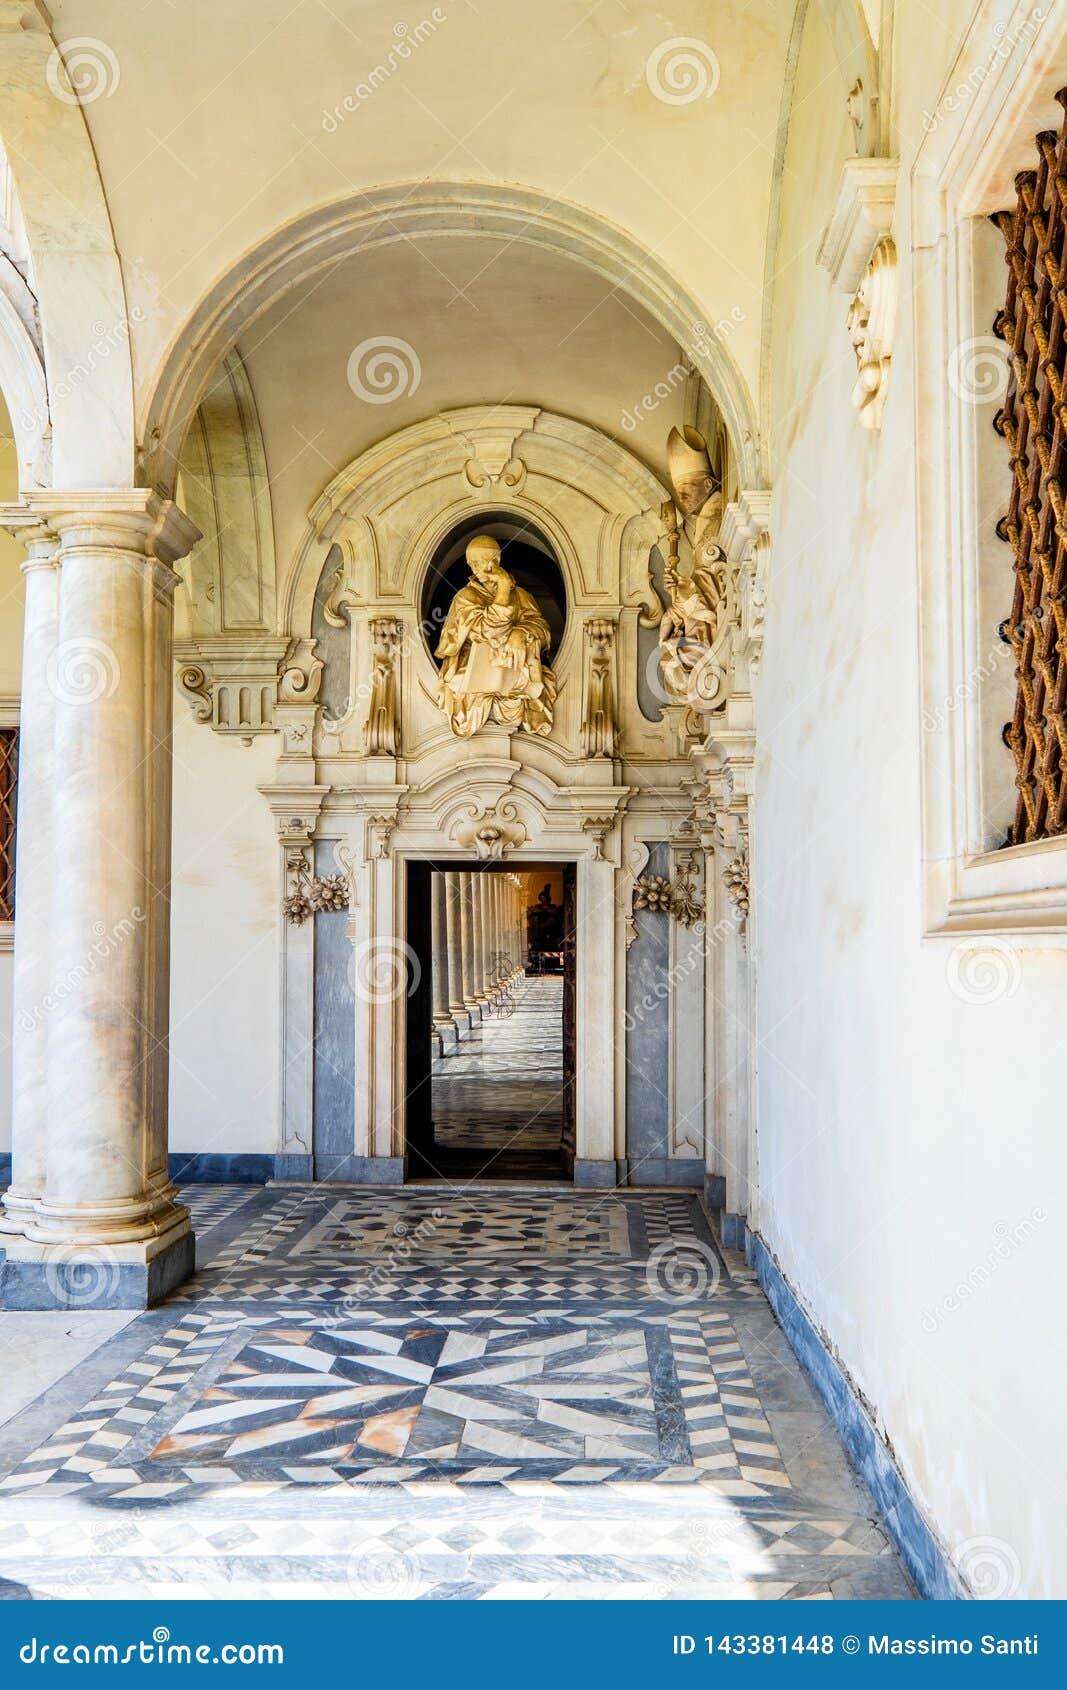 Beautiful Cloister Of San Martino Certosa Di San Martino Or Chartreuse Of Saint Martin In Springtime Naples Italy Editorial Stock Photo Image Of Nature Horizontal 143381448